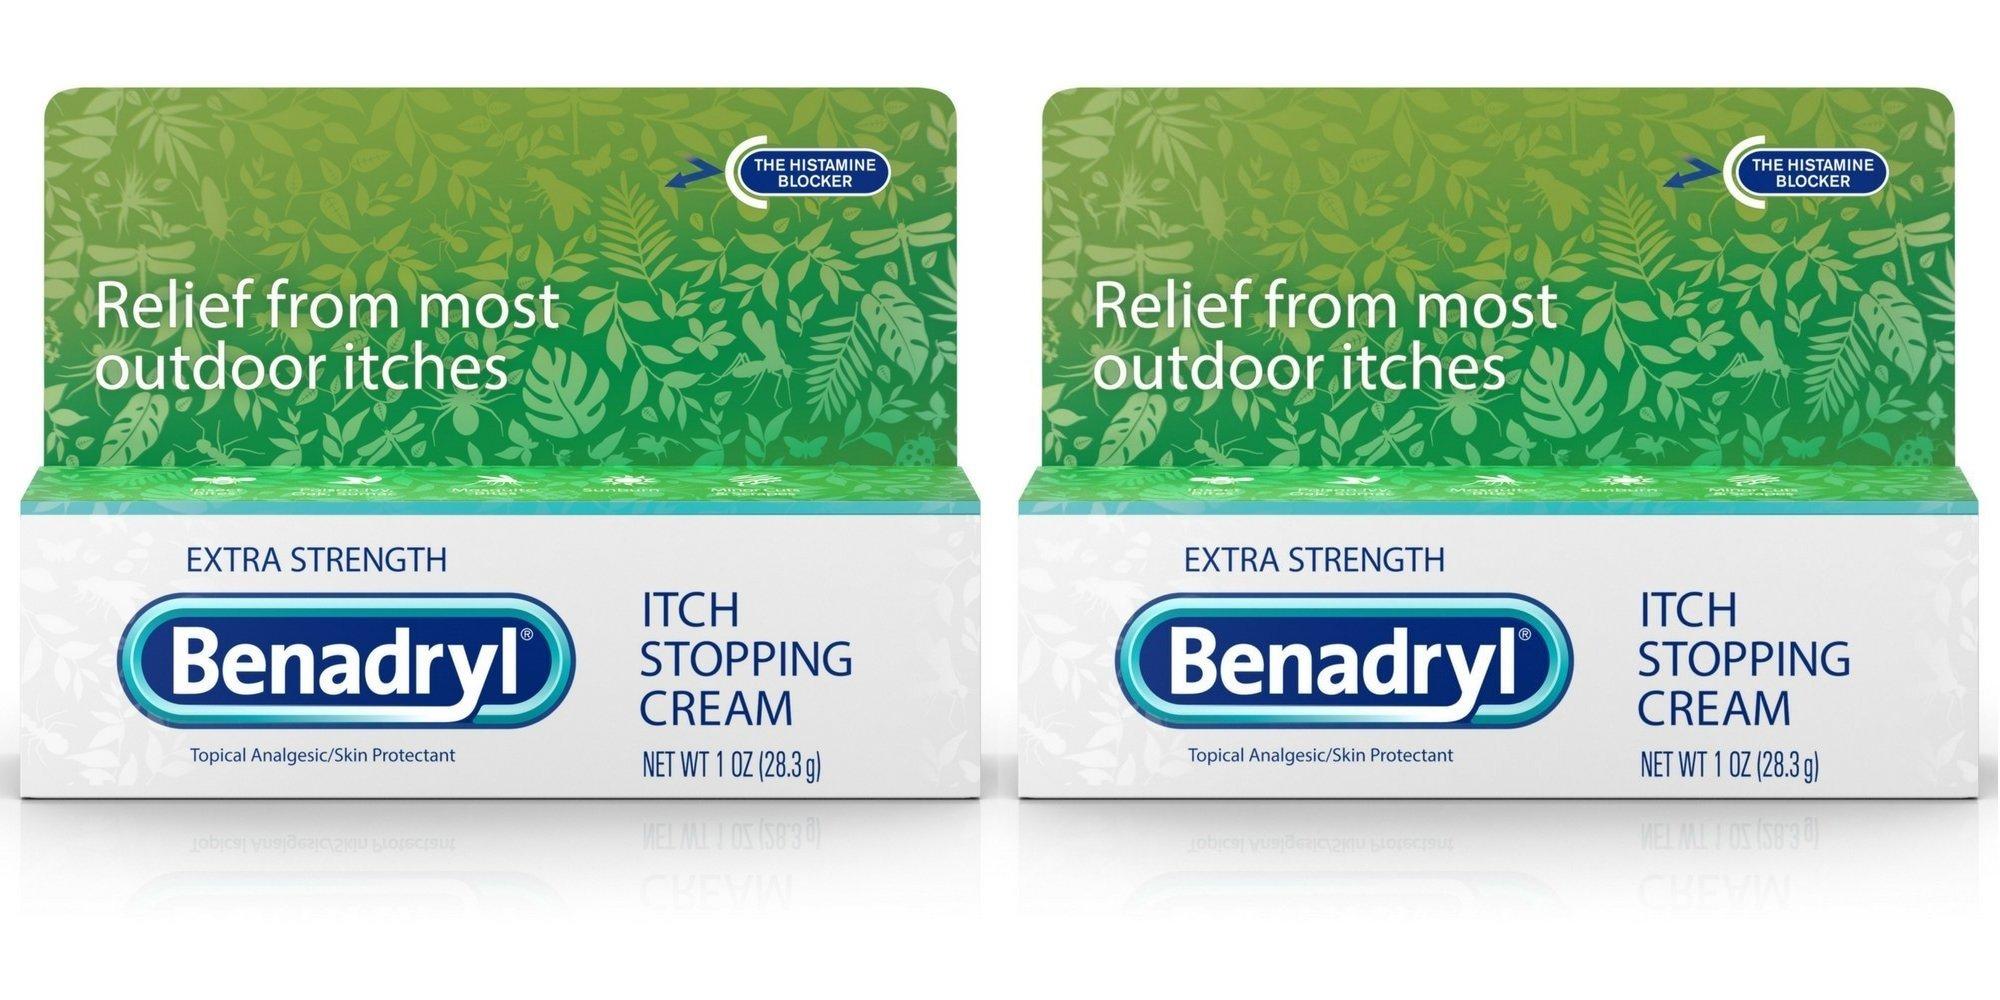 Benadryl Extra Strength Anti Itch Cream 1 Oz Tube (Pack of 2)